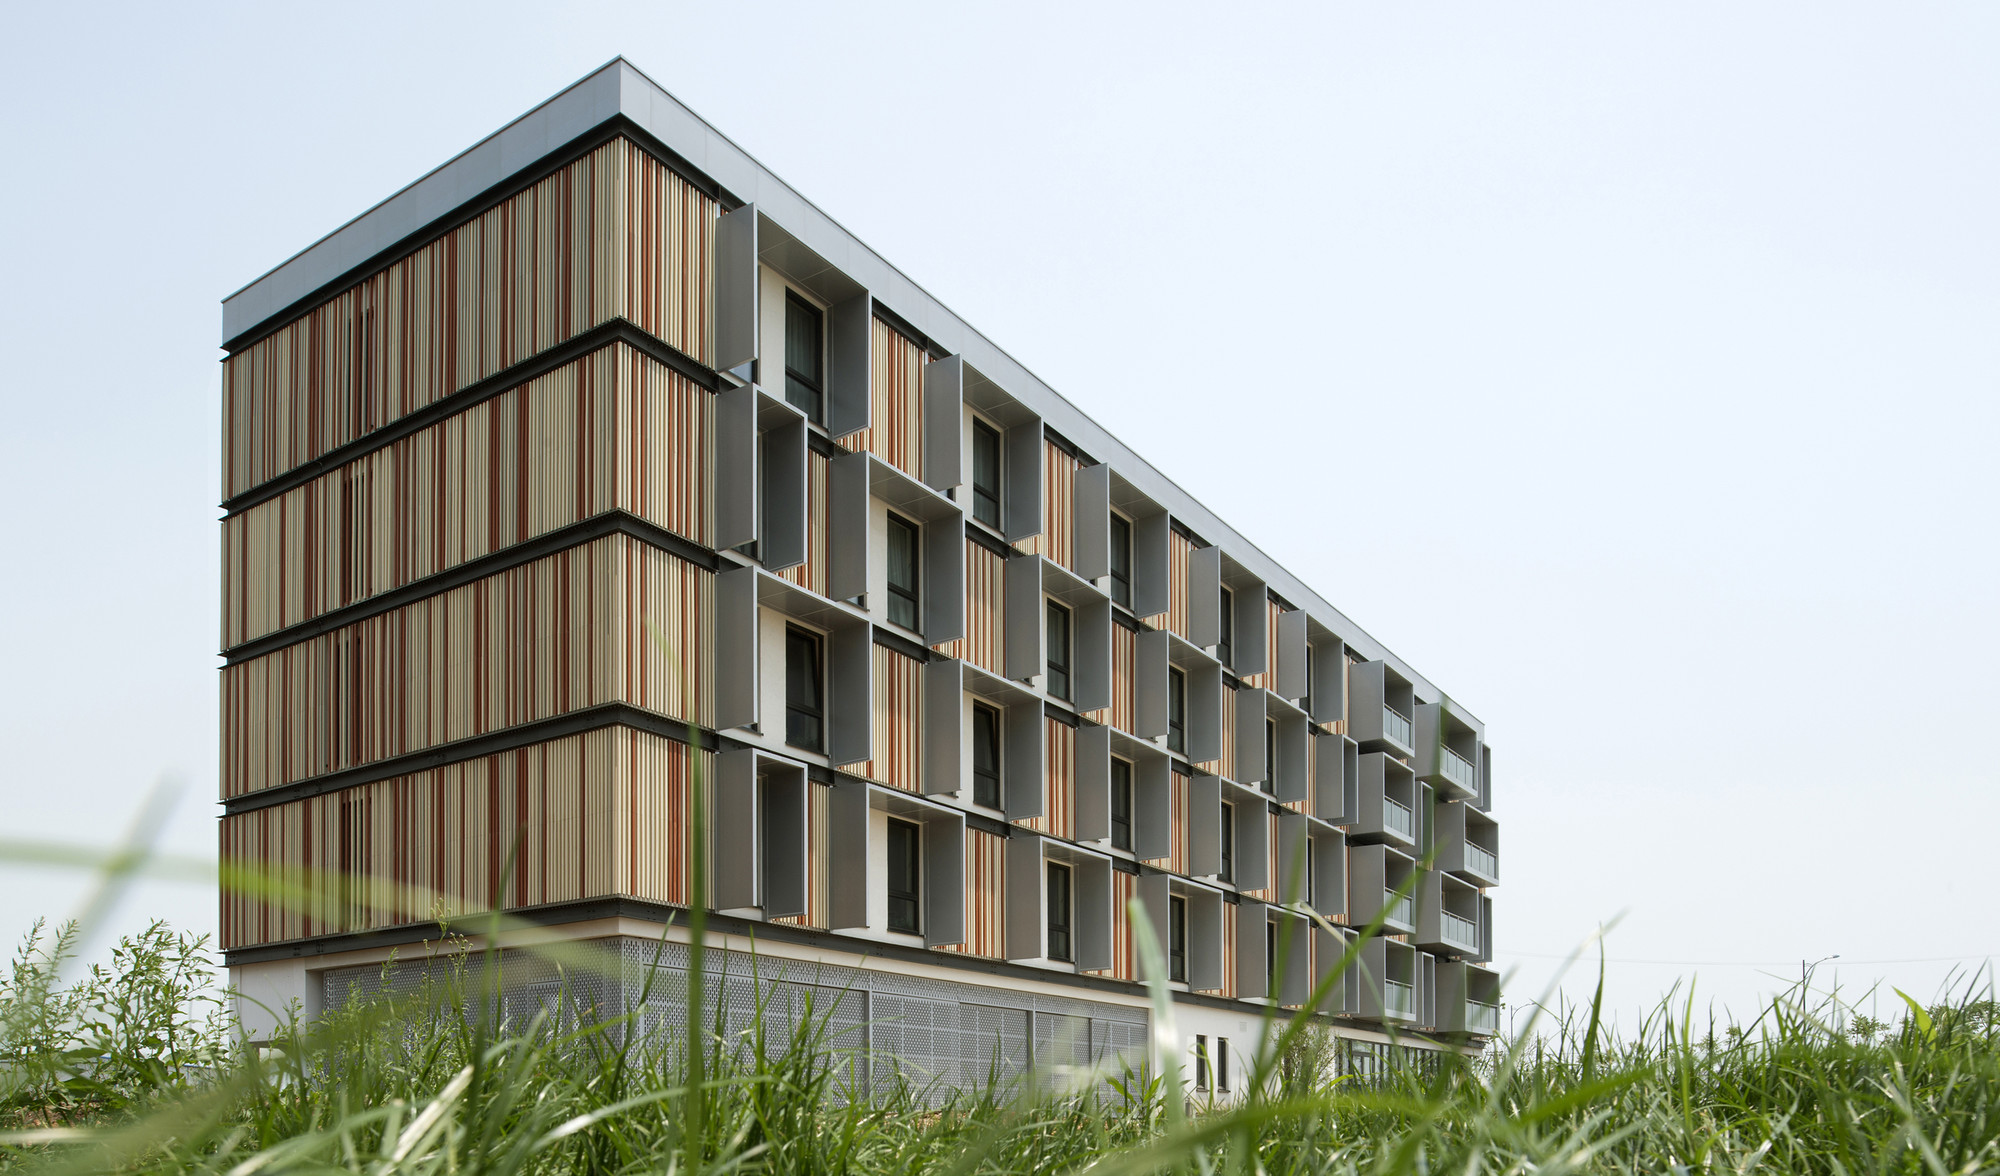 gallery of passive house bruck peter ruge architekten 14. Black Bedroom Furniture Sets. Home Design Ideas